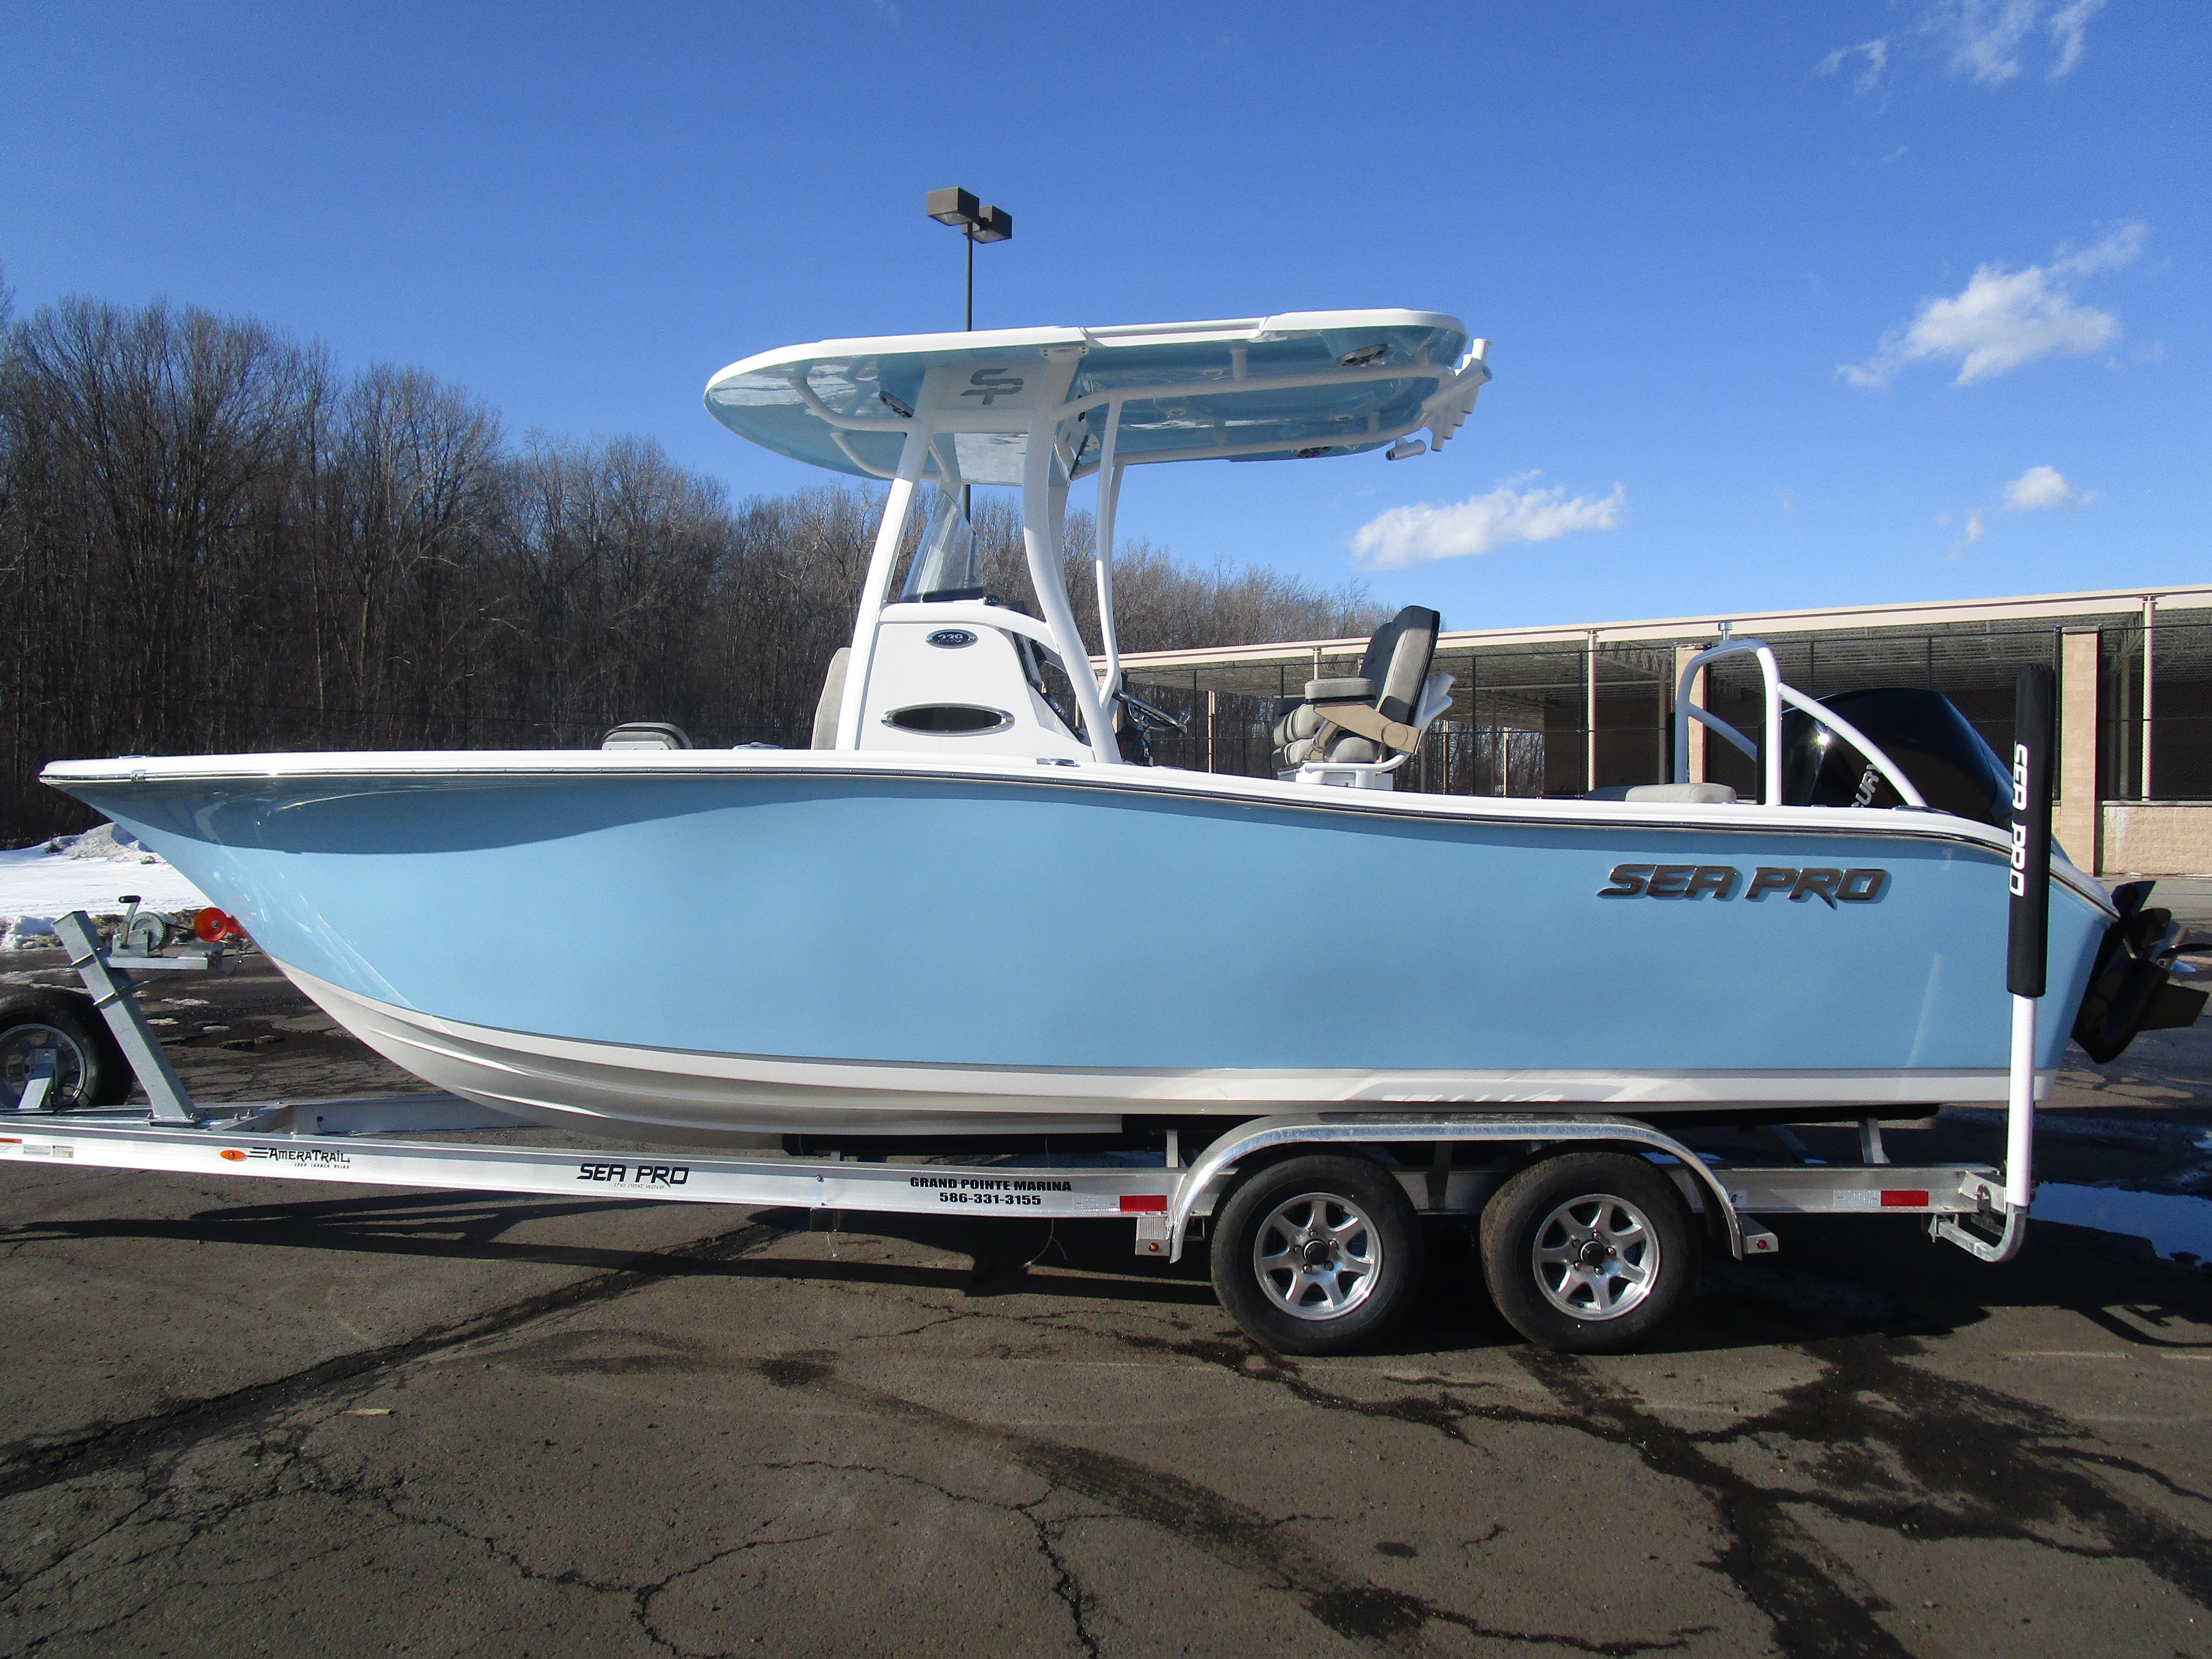 Sea Pro239 DLX